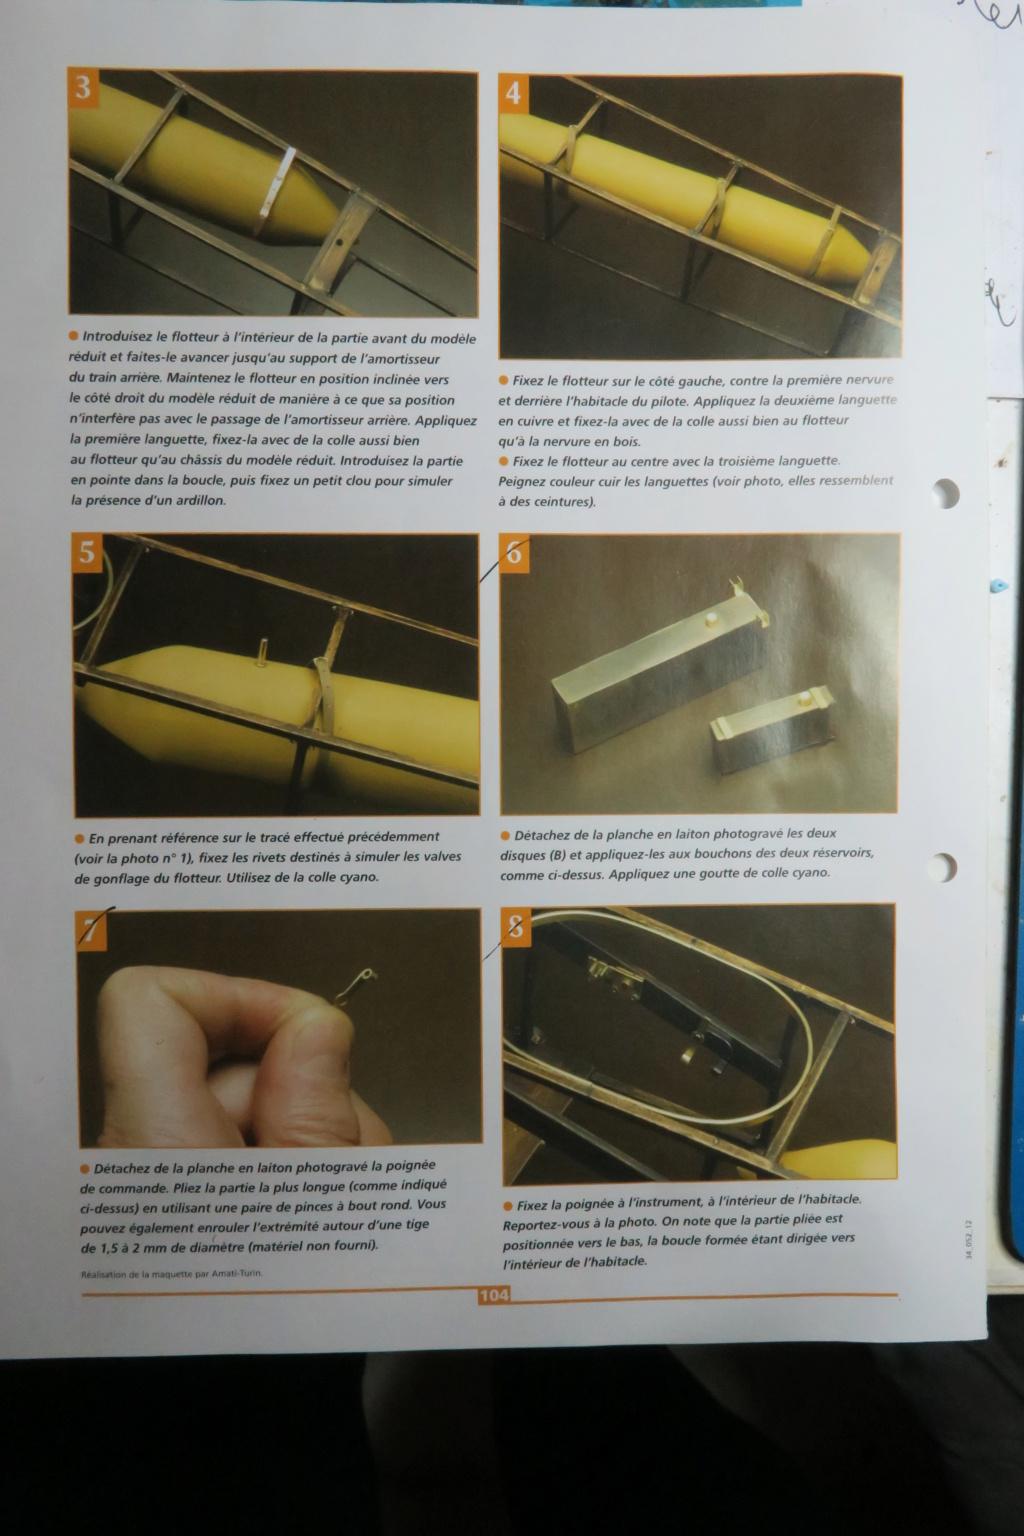 Blériot XI 1/10è  Hachette - Page 6 Img_0275